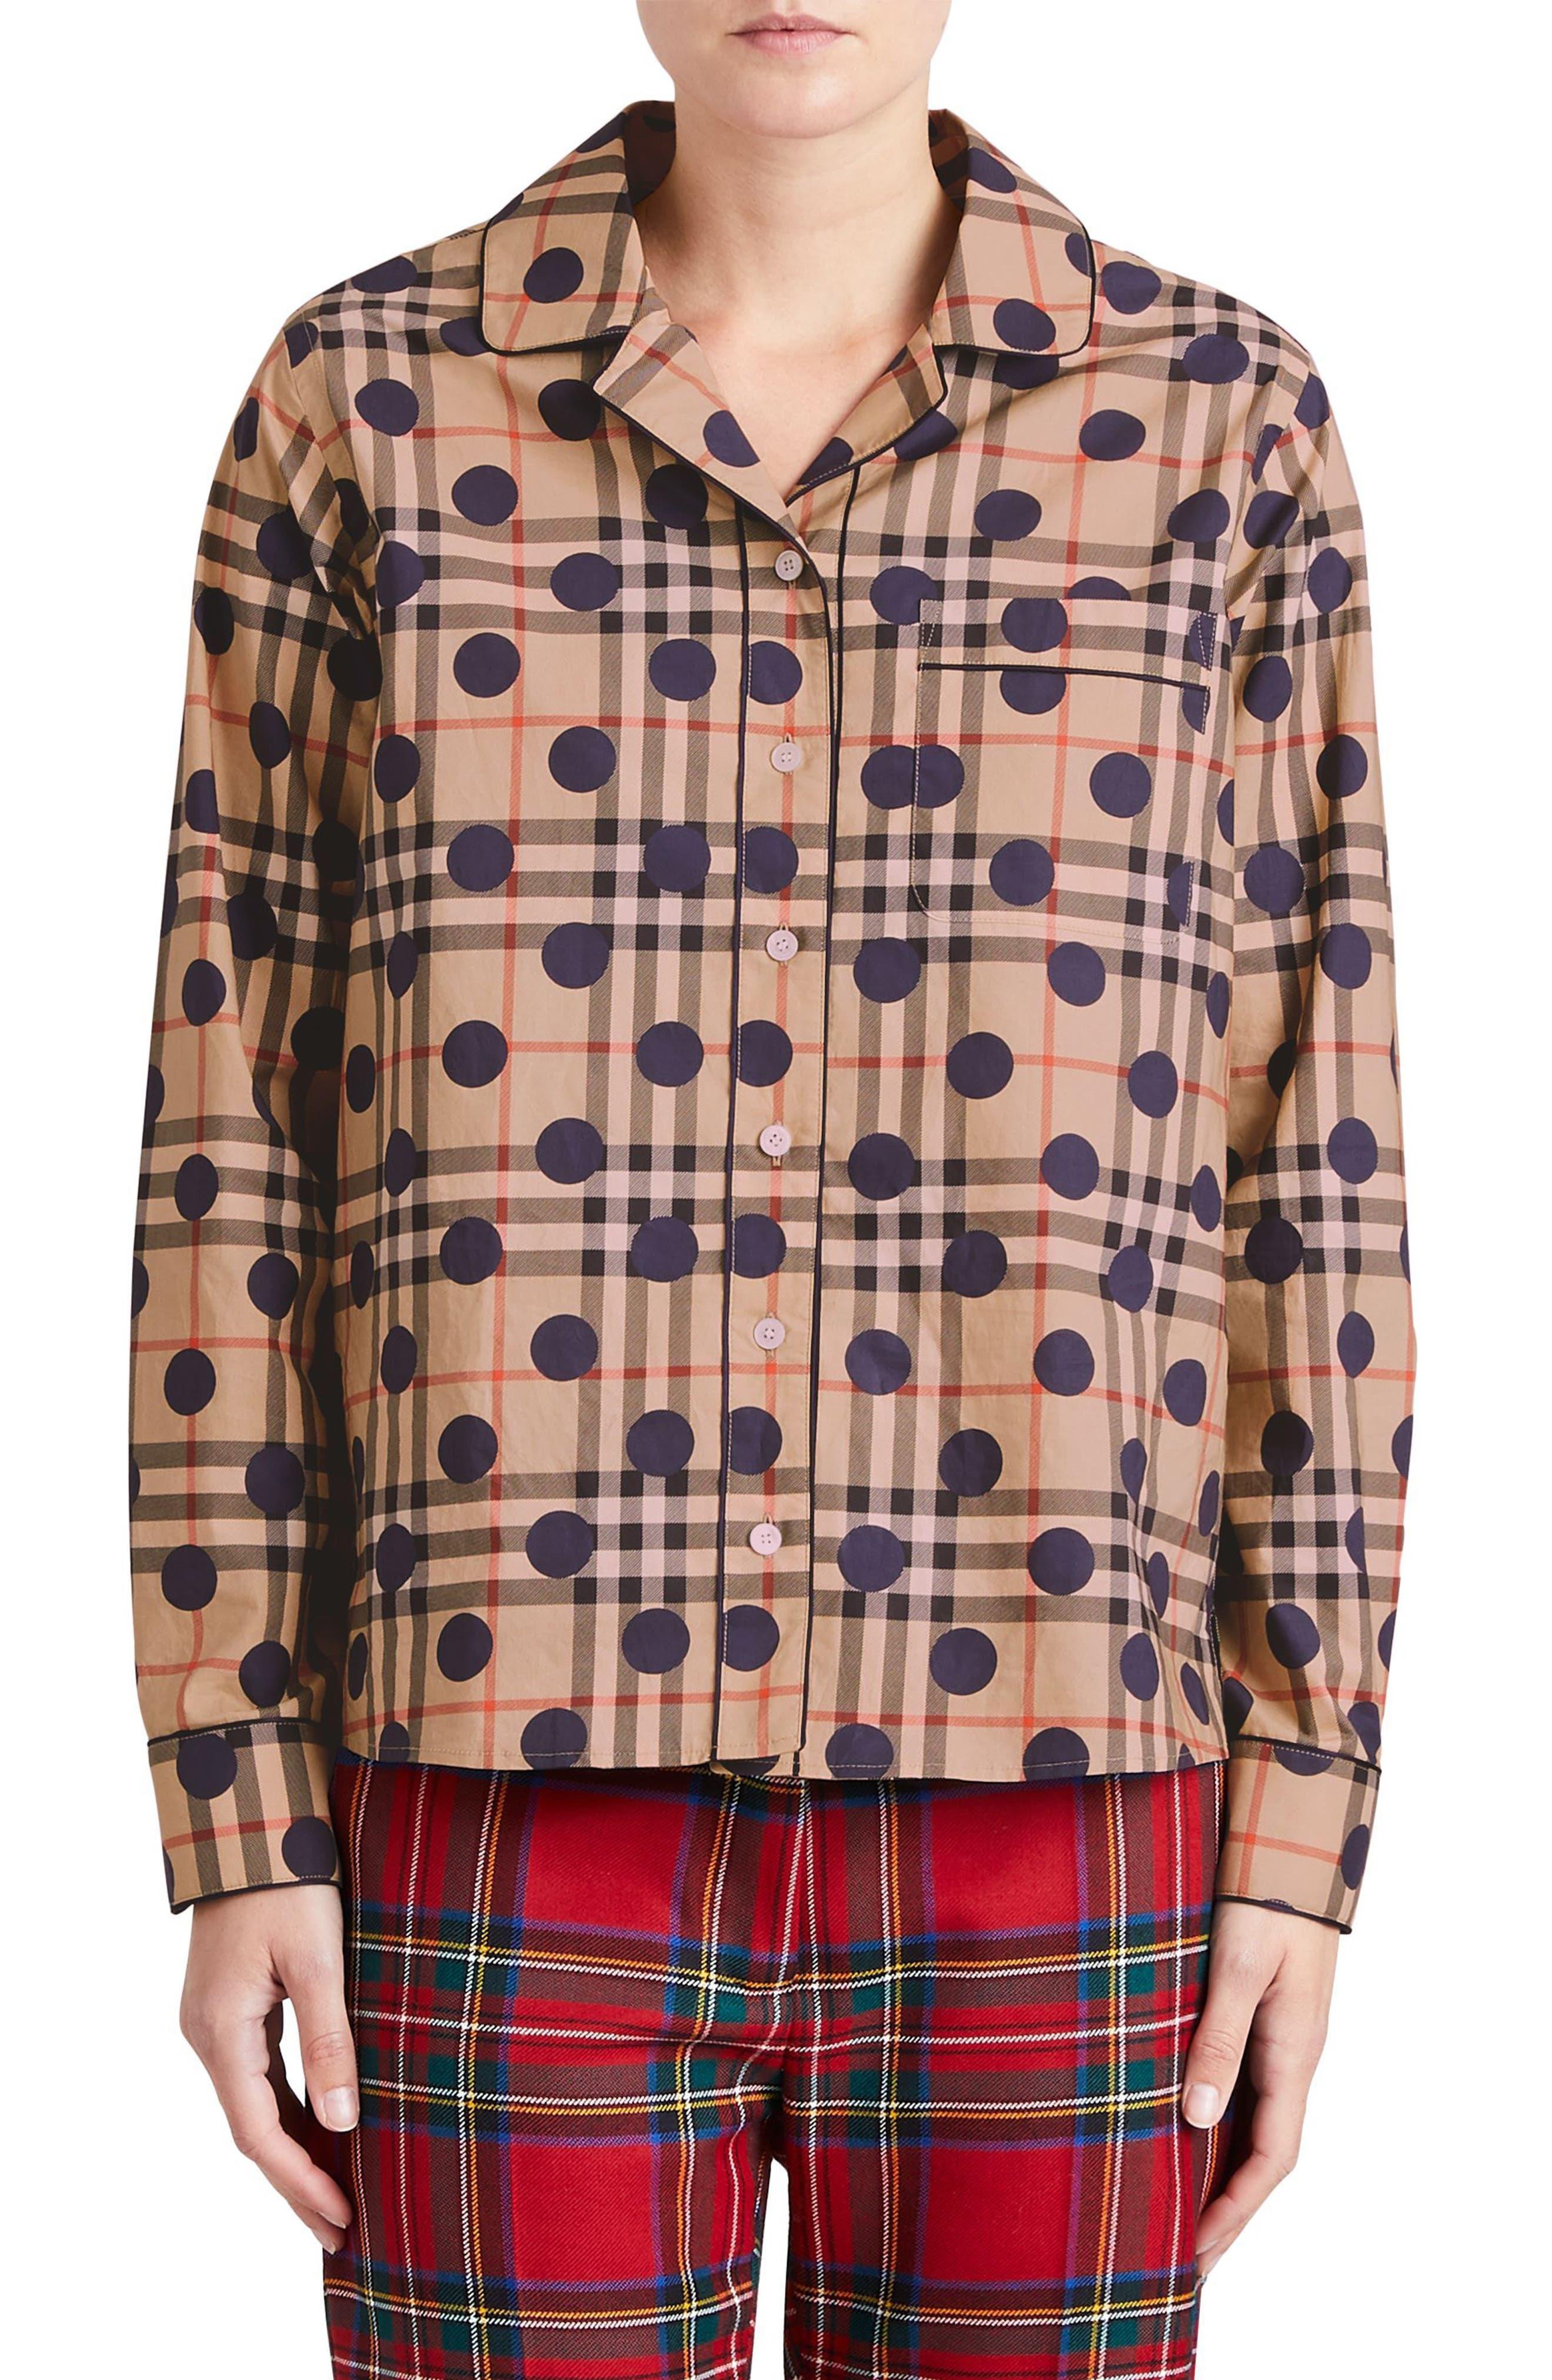 Polka Dot Check Print Cotton Shirt,                             Main thumbnail 1, color,                             Camel Multi